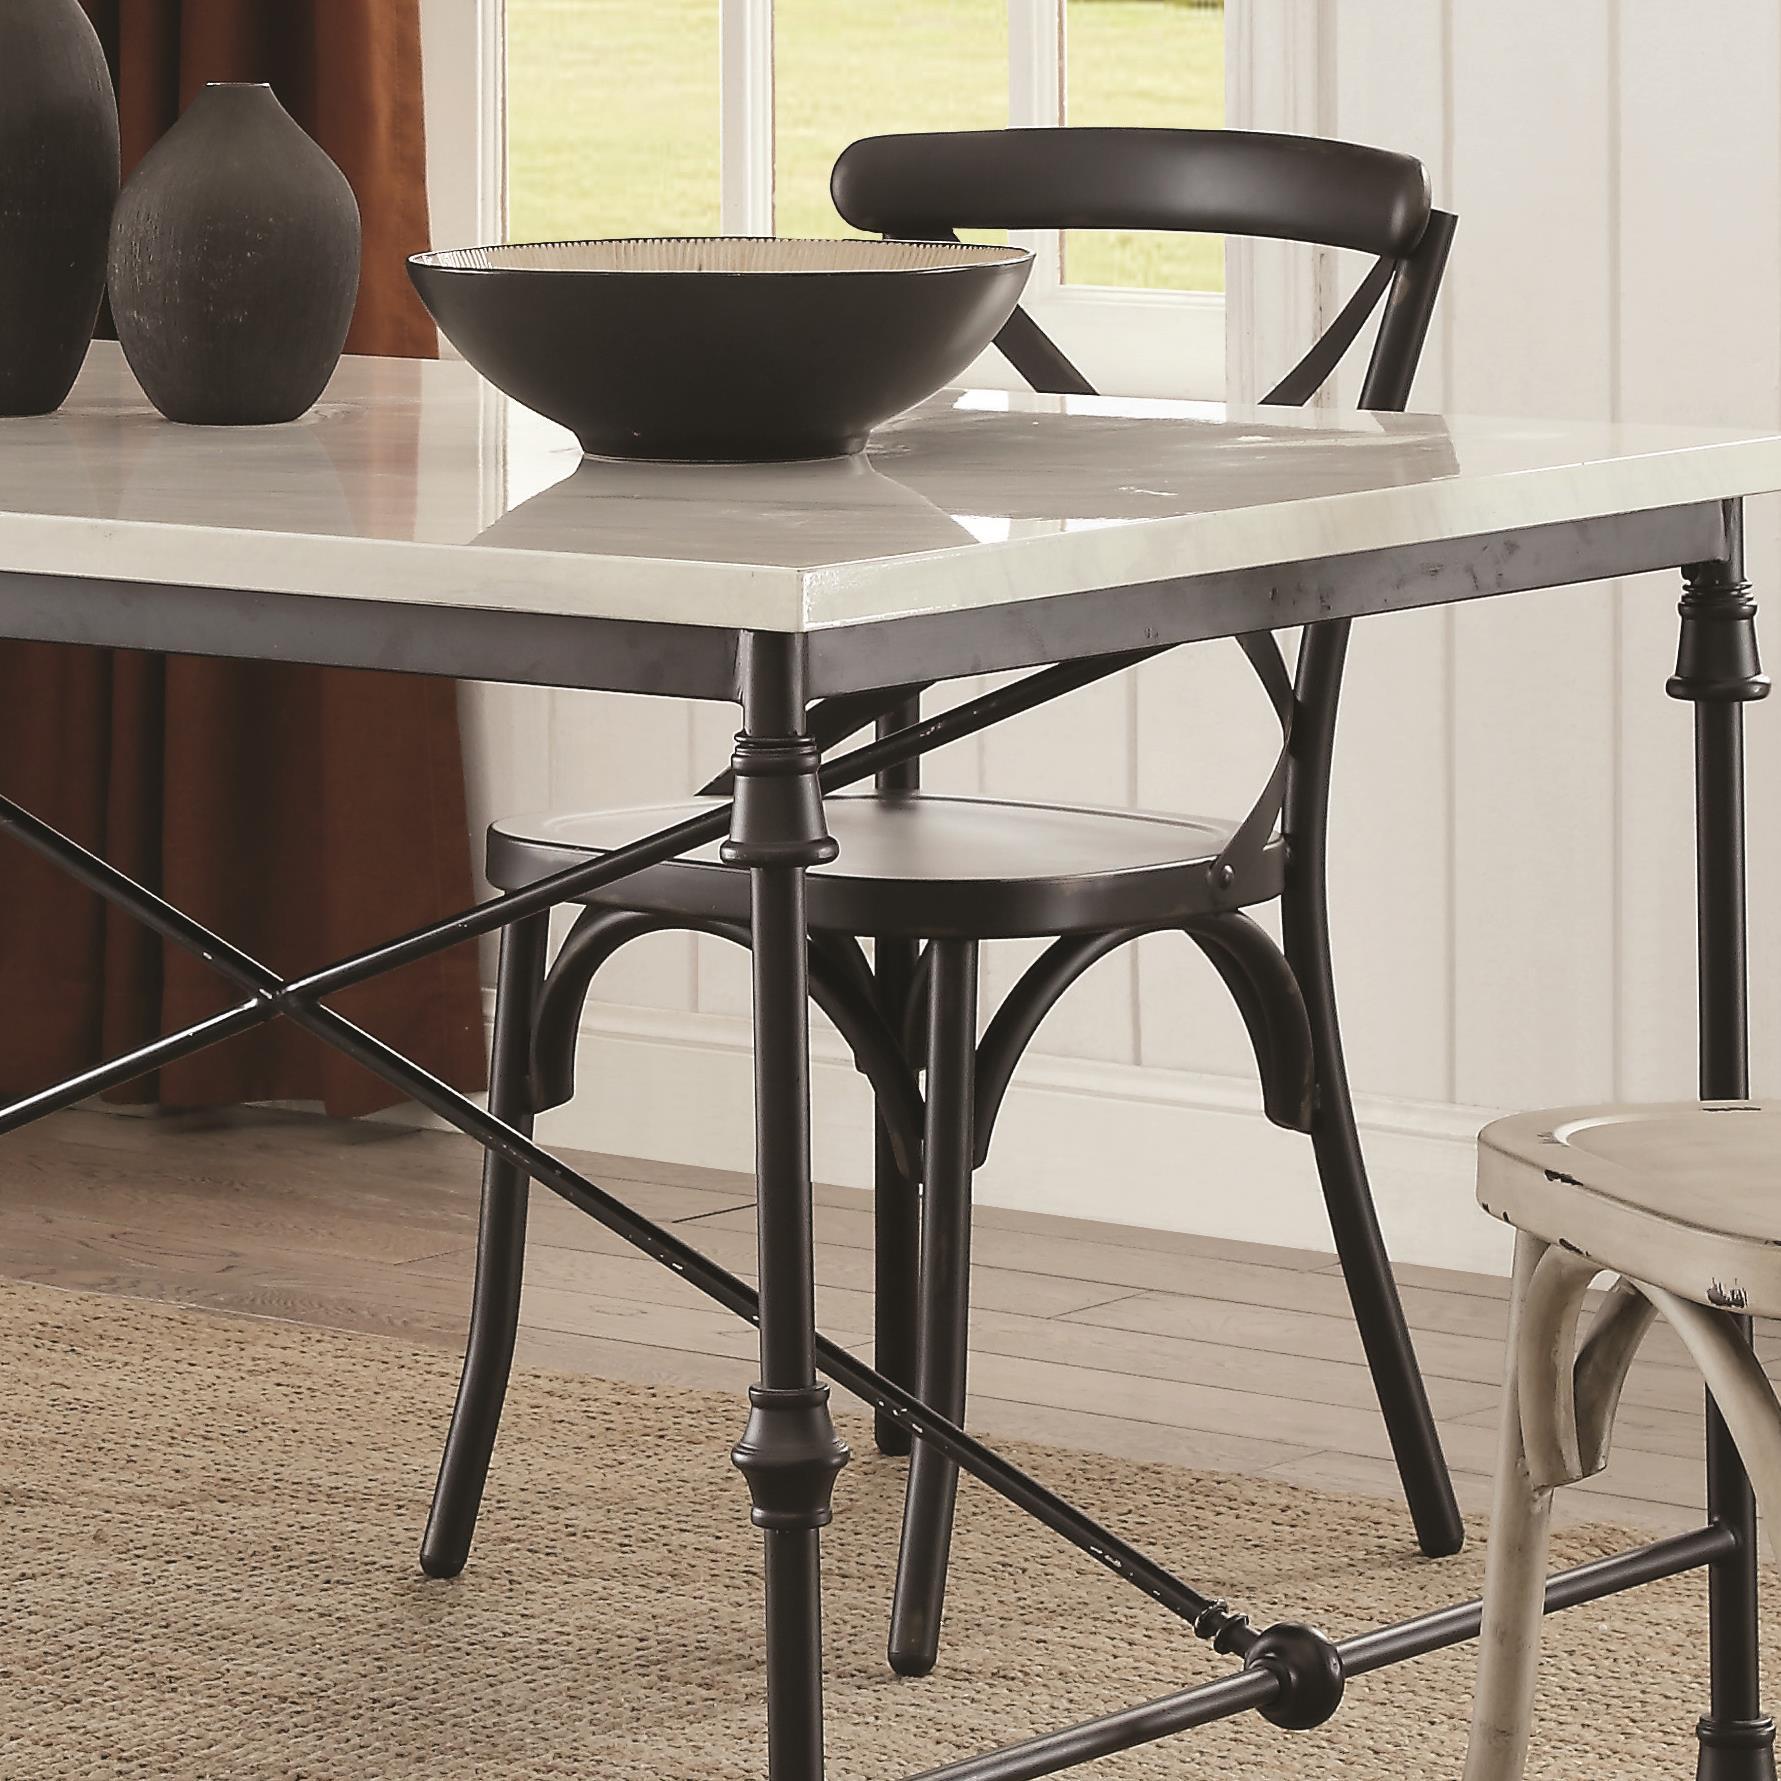 Nagel Rustic Metal Dining Chair ...